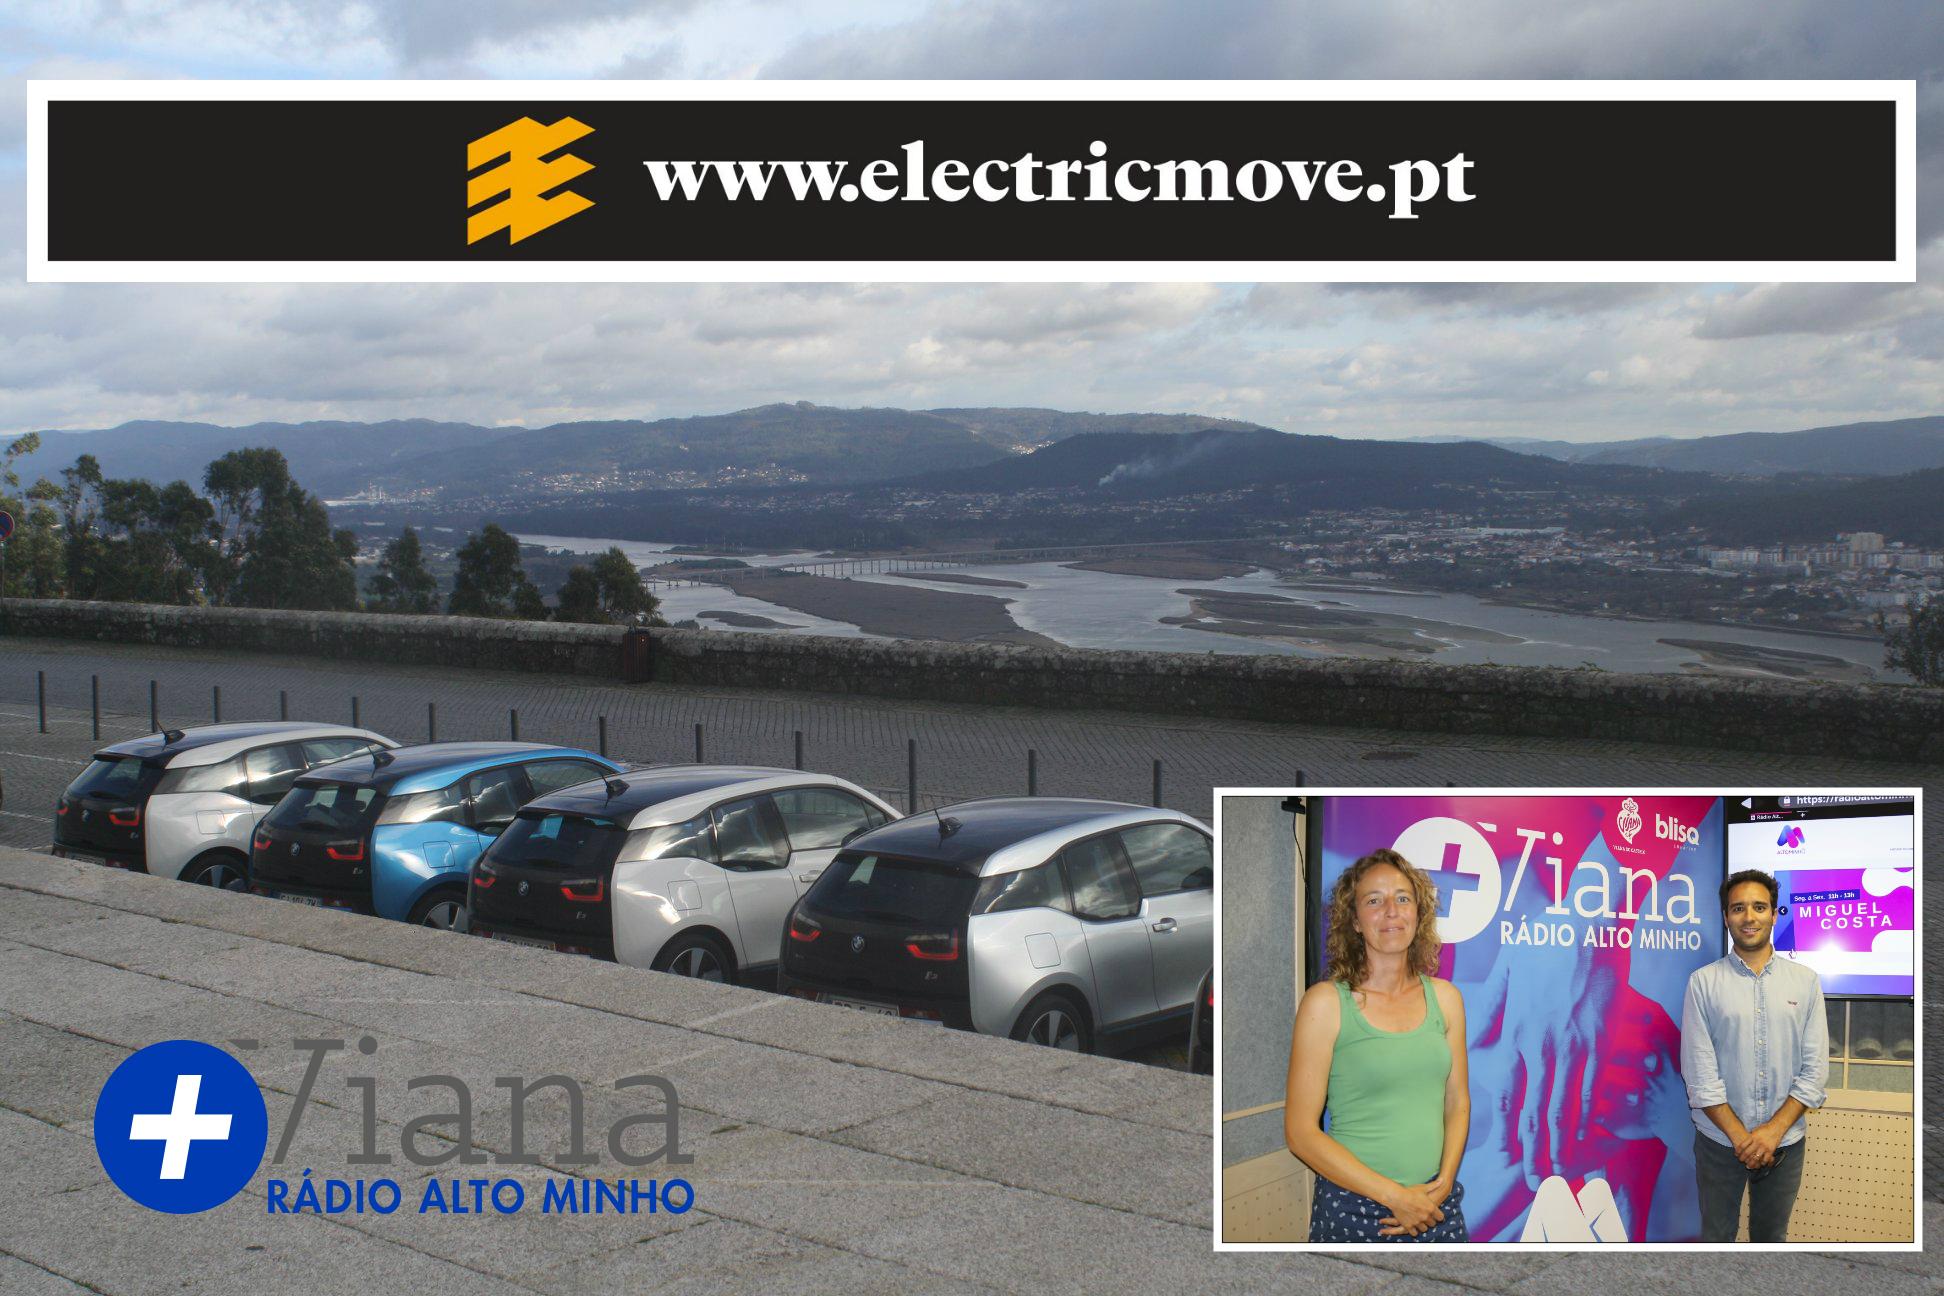 +Viana: Electric Move